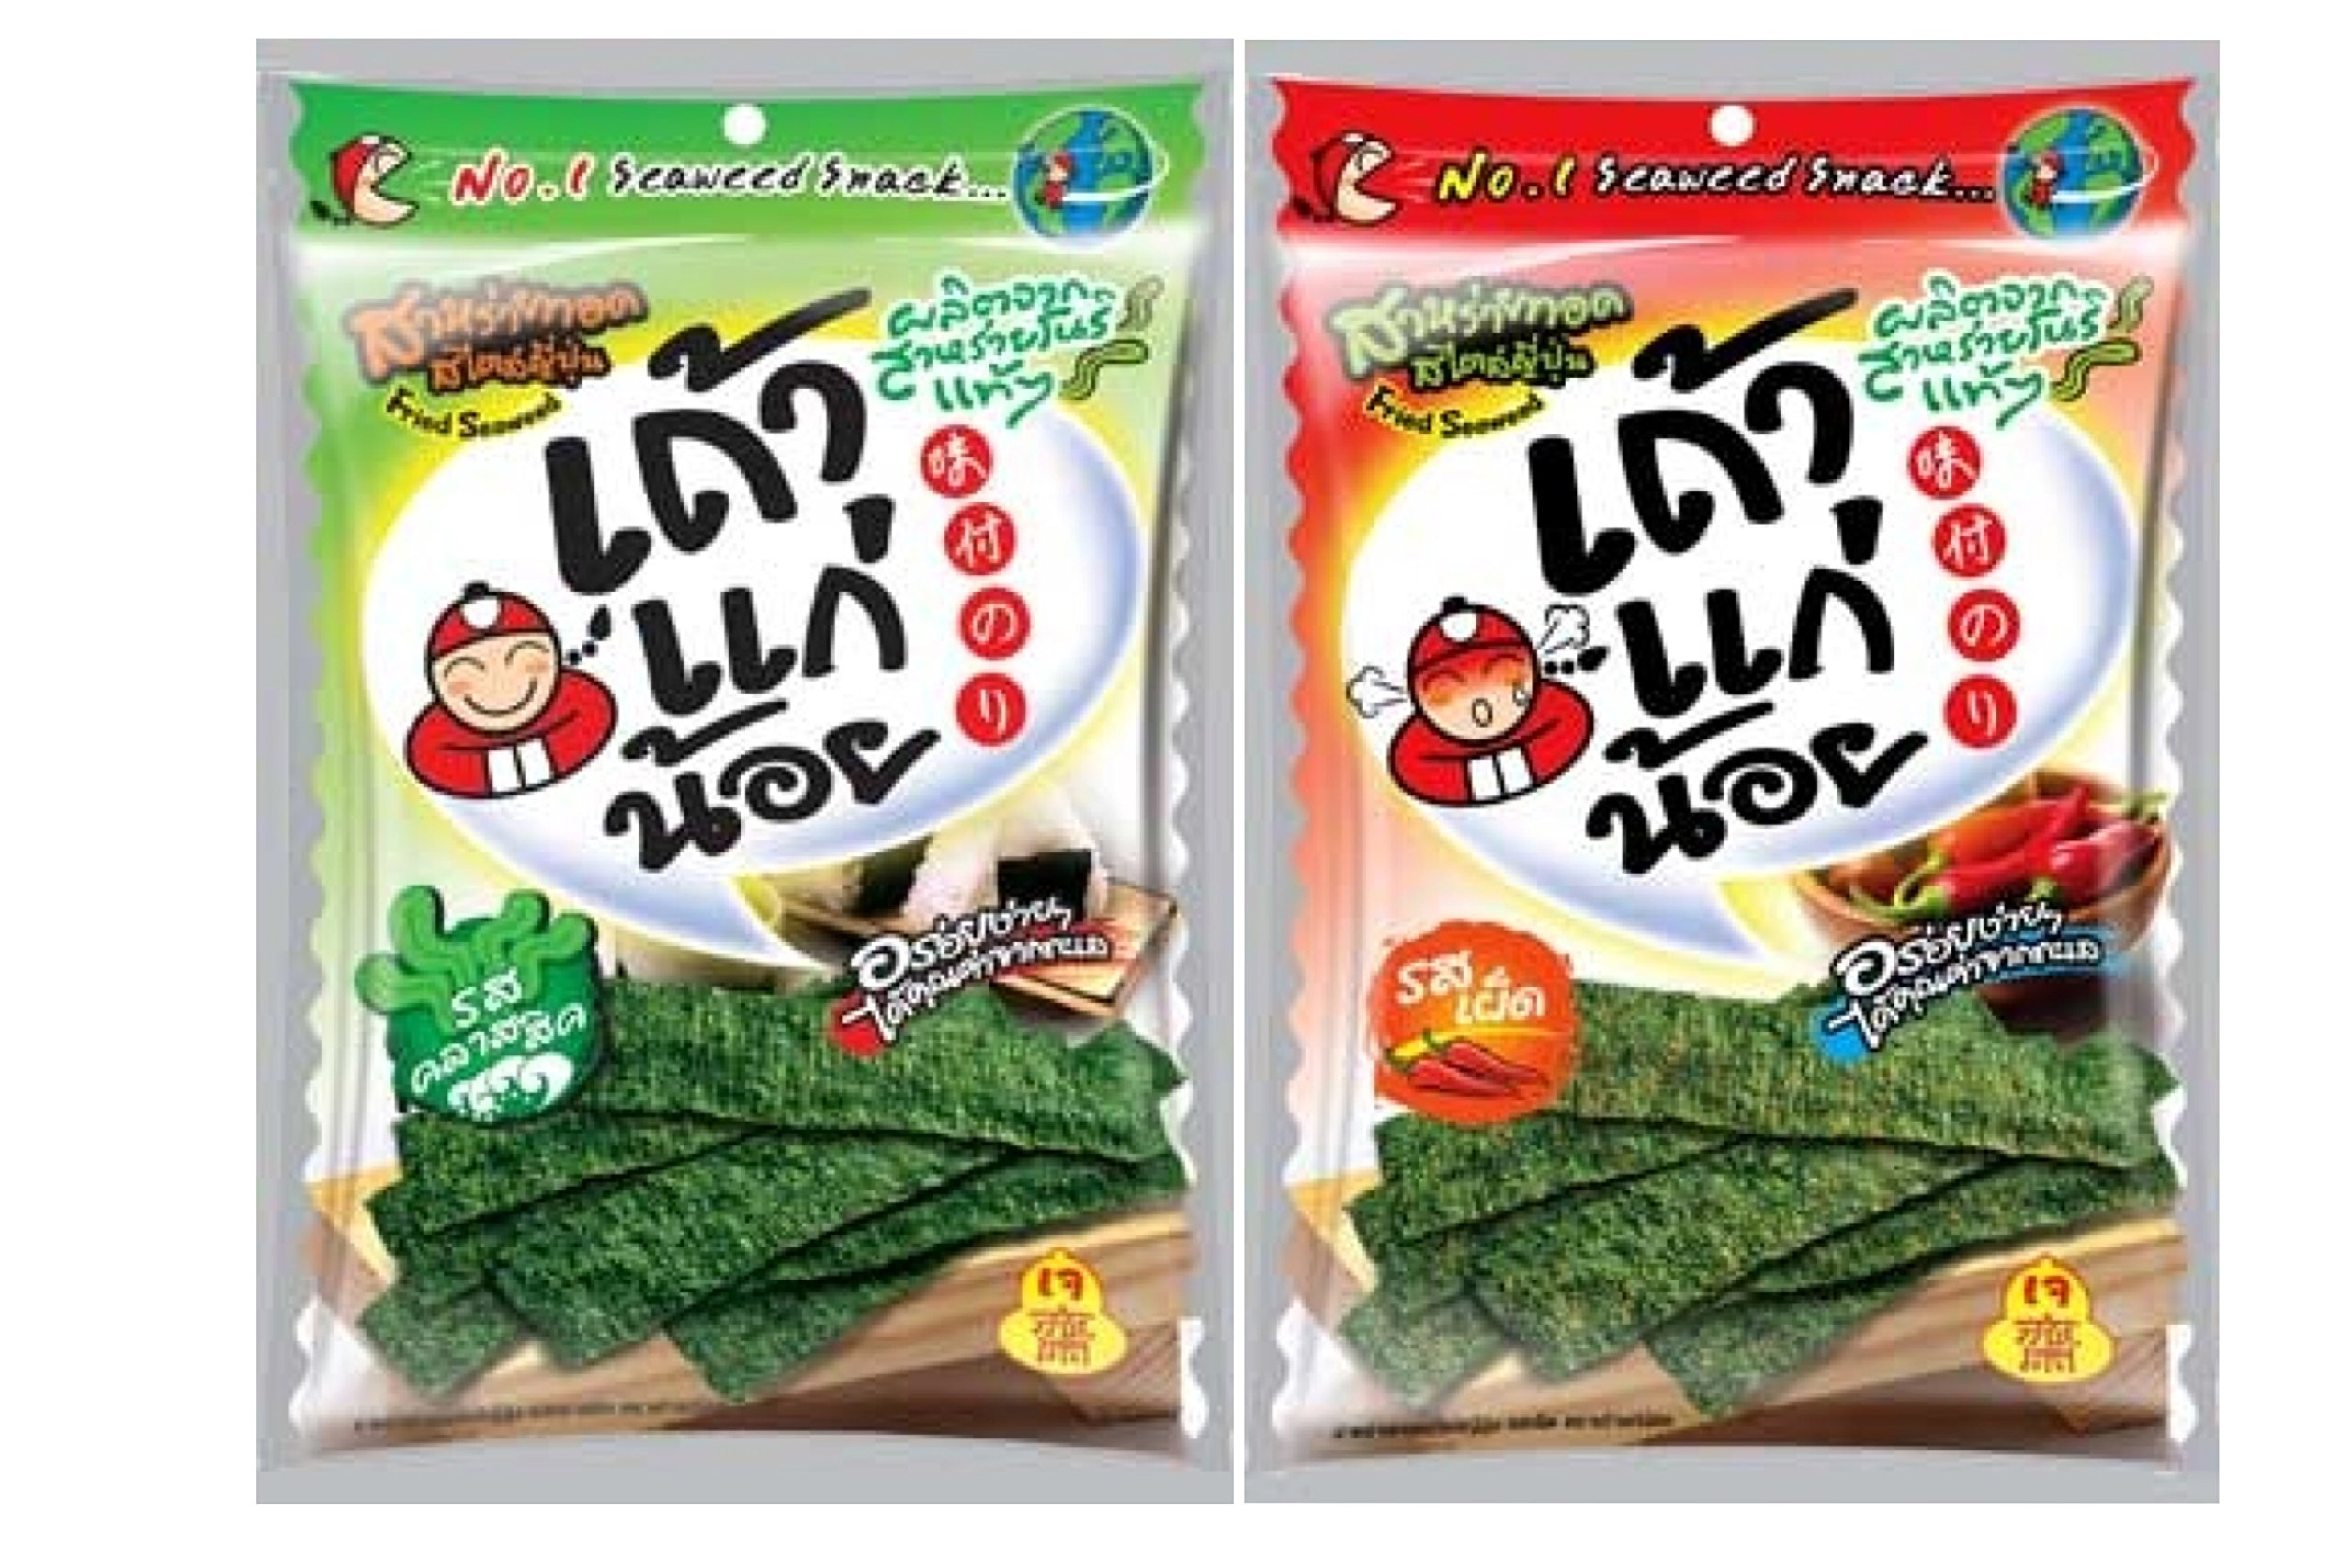 2pcs X 36g Tao Kae Noi Fried Crispy Seaweed Snack Original Classic Flavor & Spicy Flavor